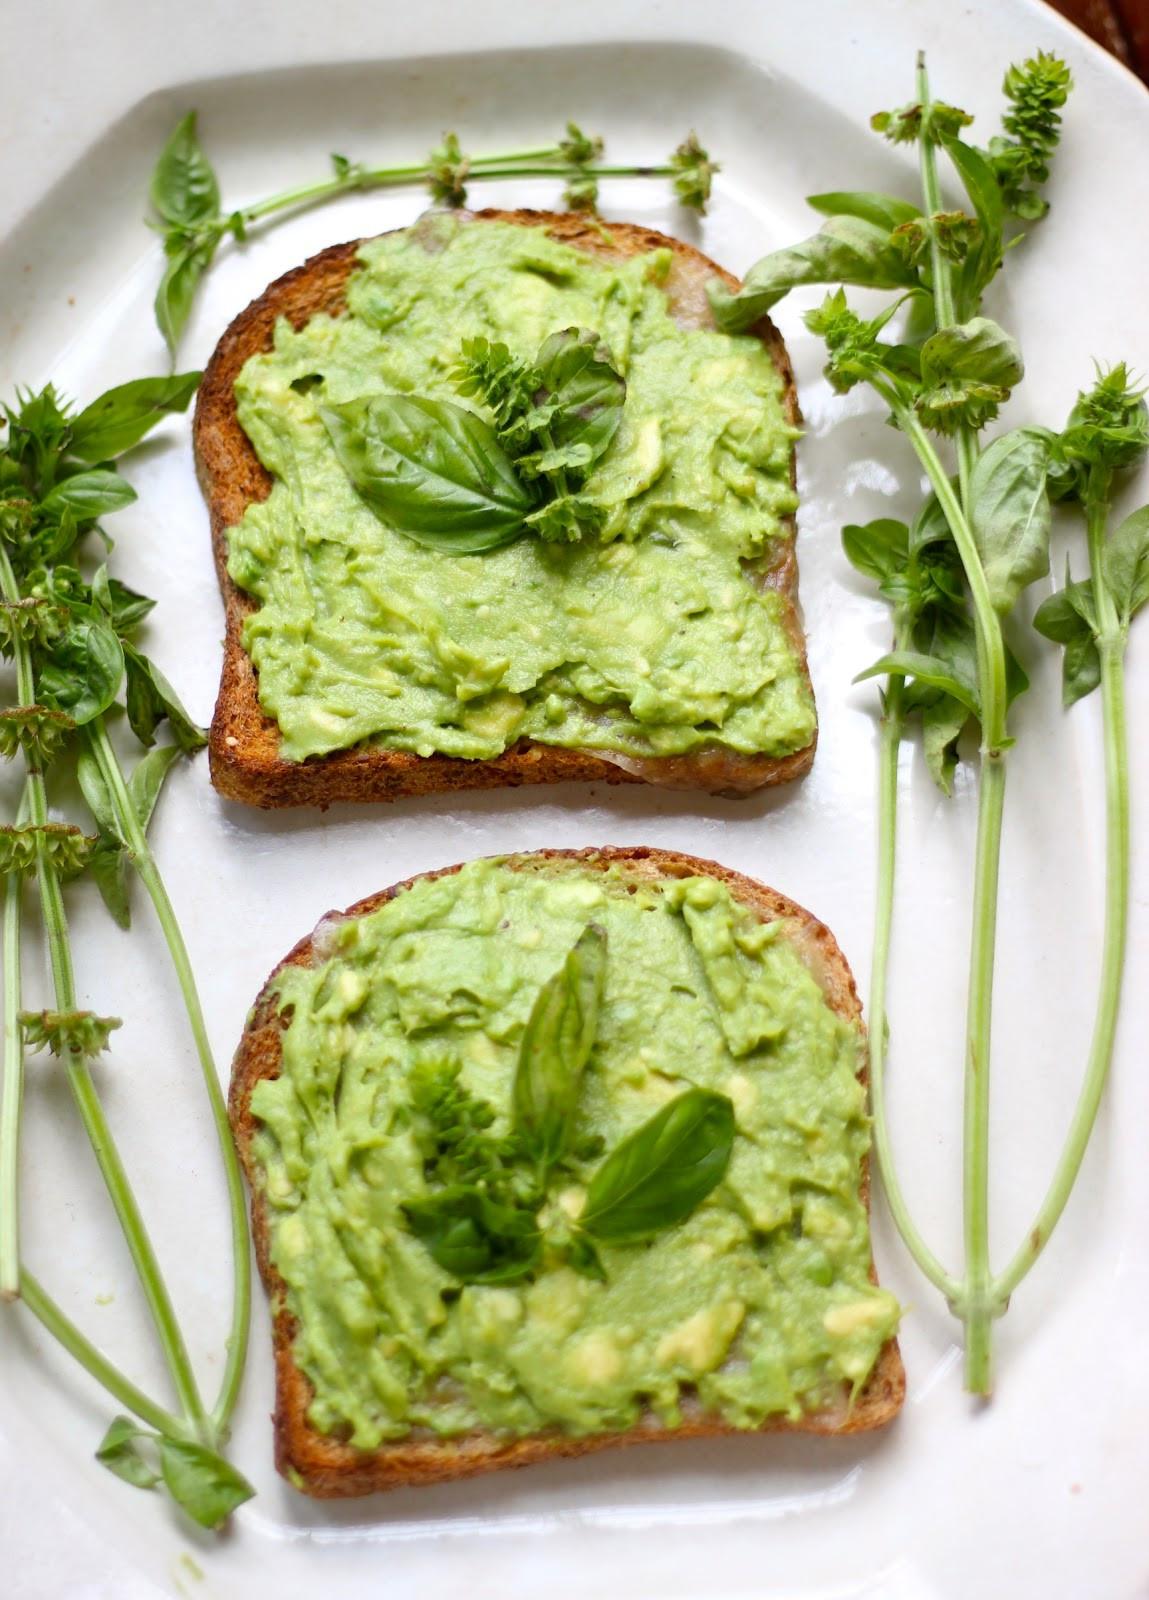 Healthy Recipes With Avocado  Intrinsic Beauty Healthy Recipes Avocado Toast